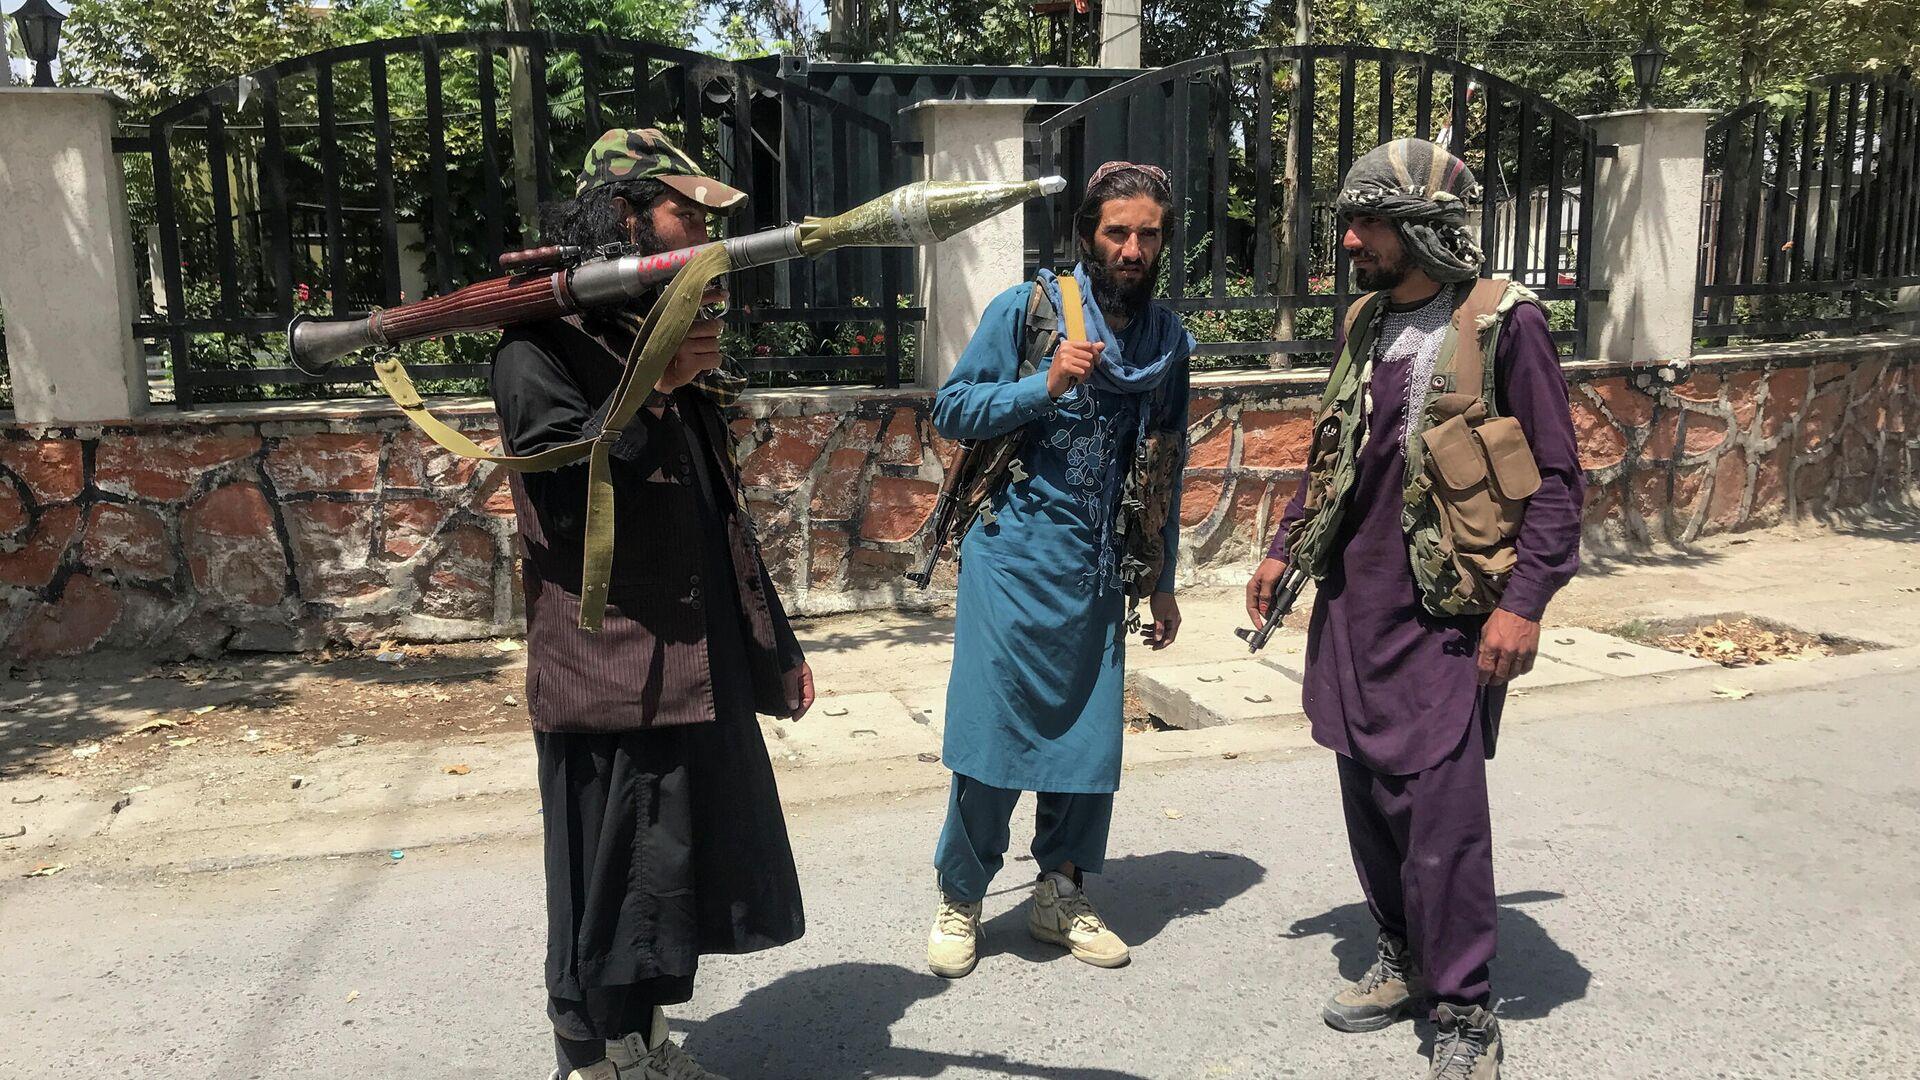 Силы Талибана в Кабуле, Афганистан - Sputnik Тоҷикистон, 1920, 01.09.2021